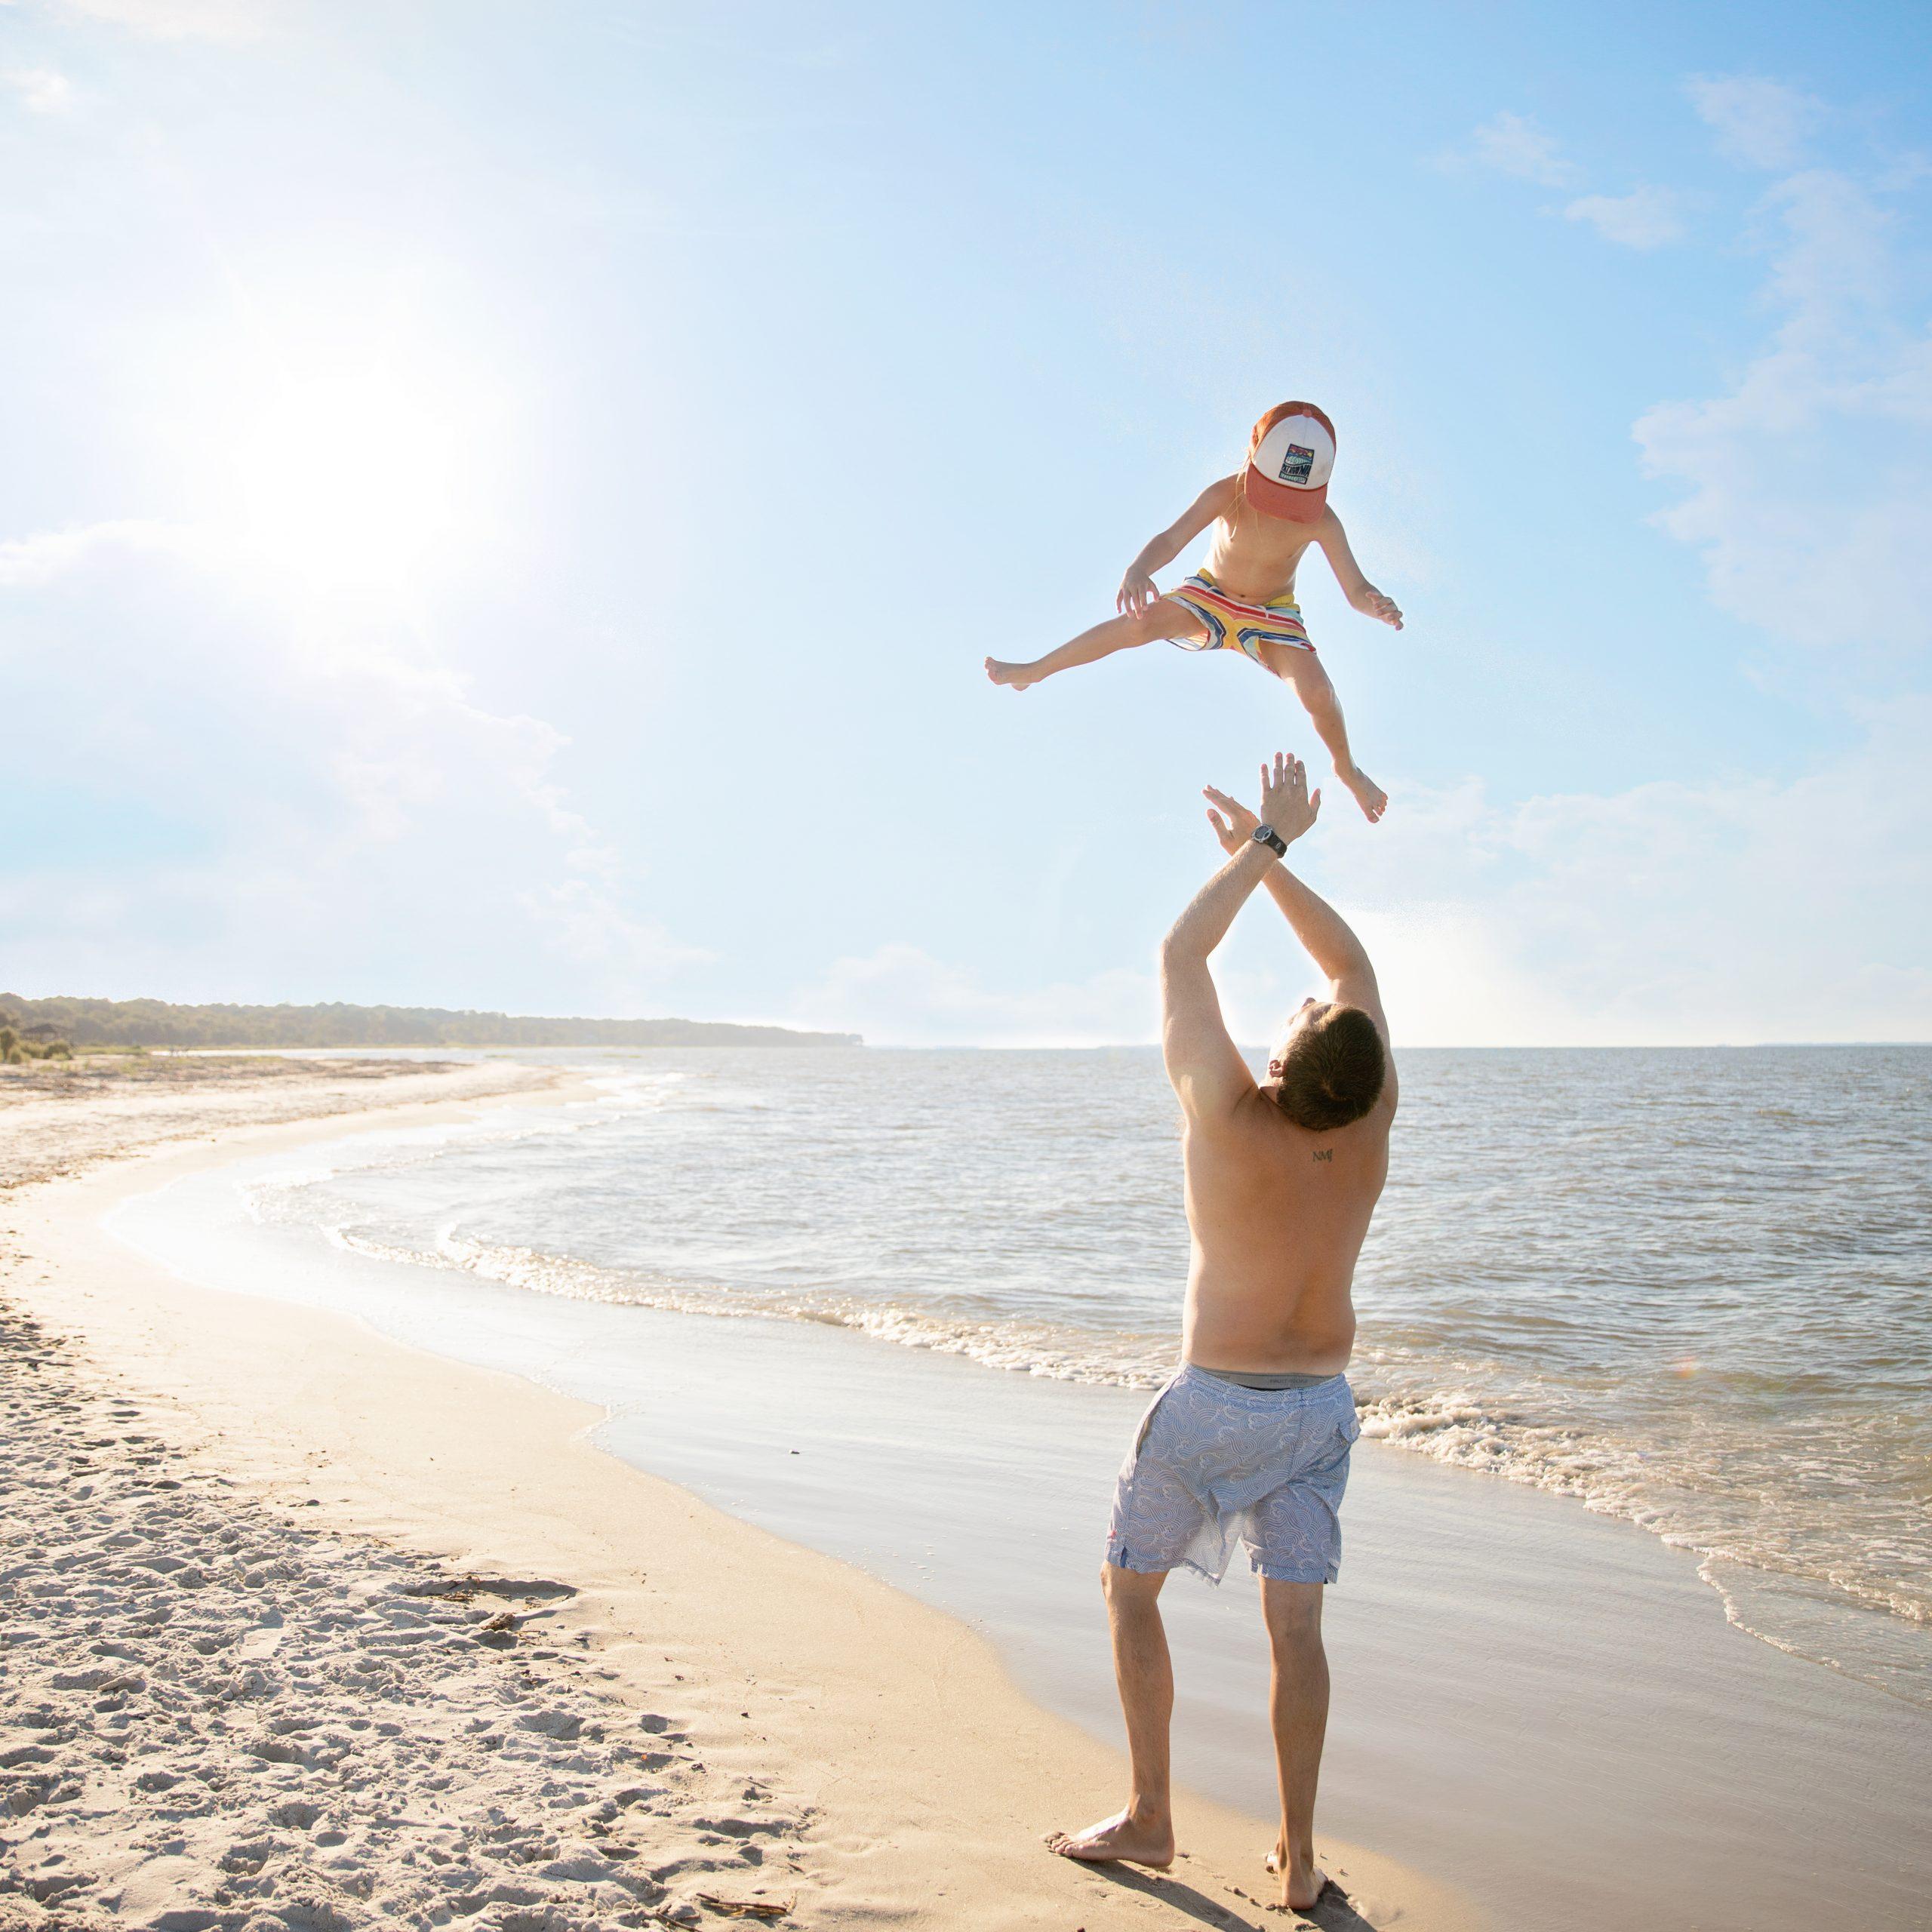 Water Safety 2021 Hilton Head Island South Carolina Water Safety